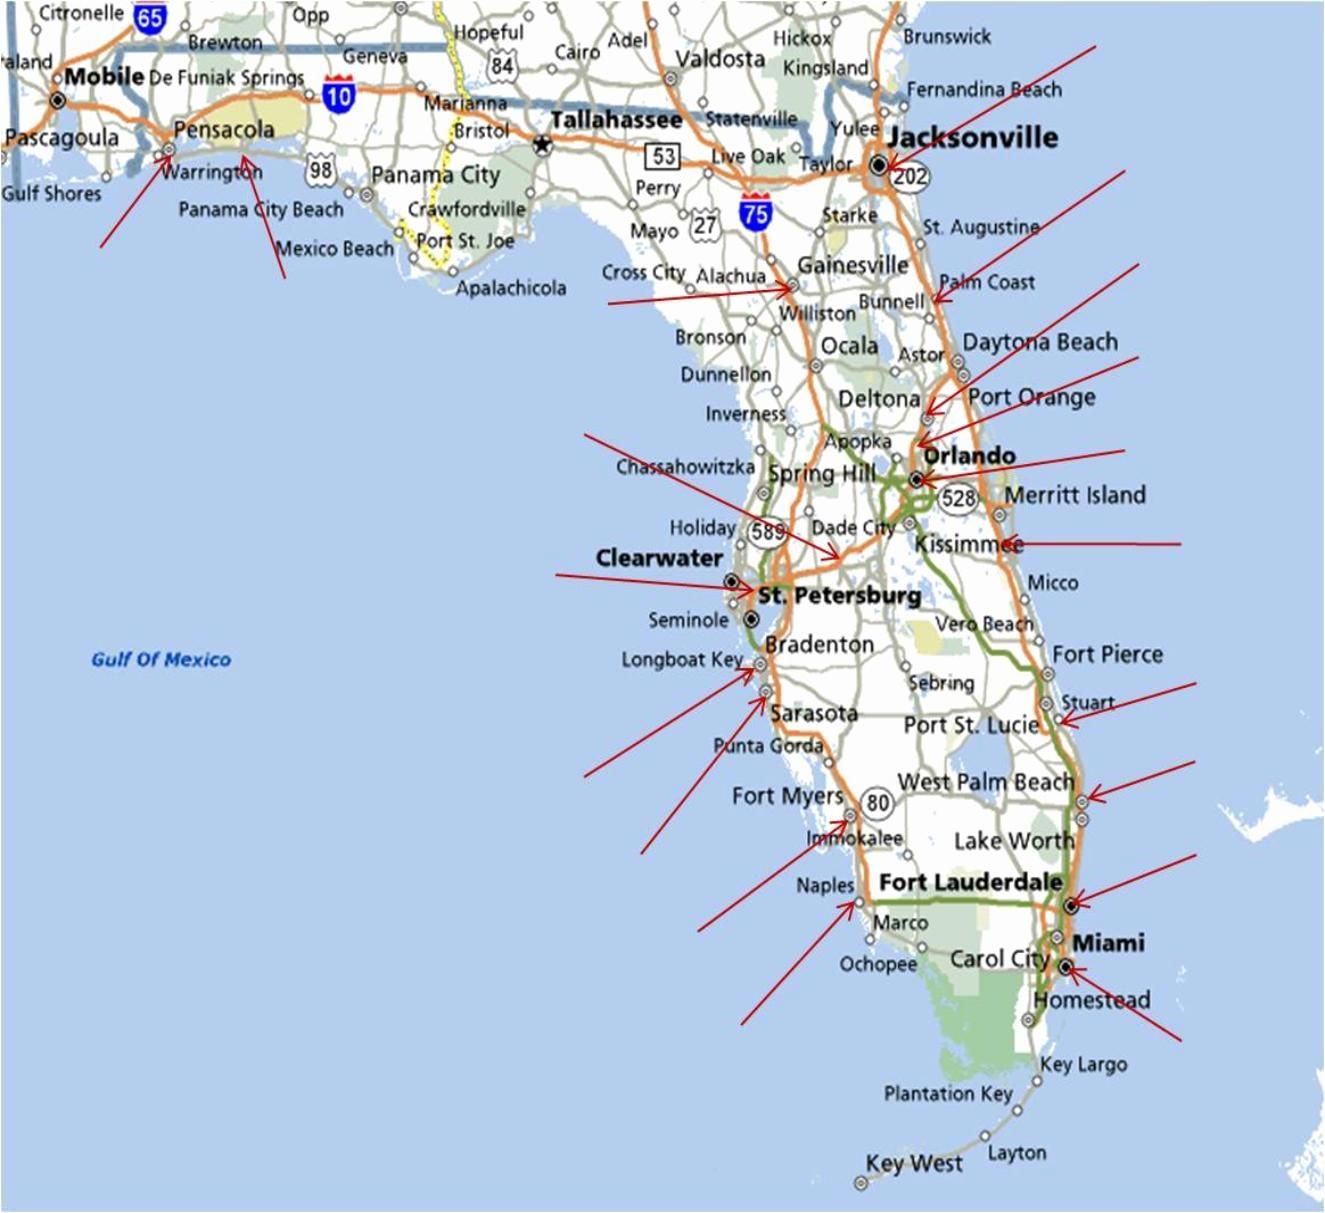 Best East Coast Florida Beaches New Map Florida West Coast Florida - Best Florida Gulf Coast Beaches Map